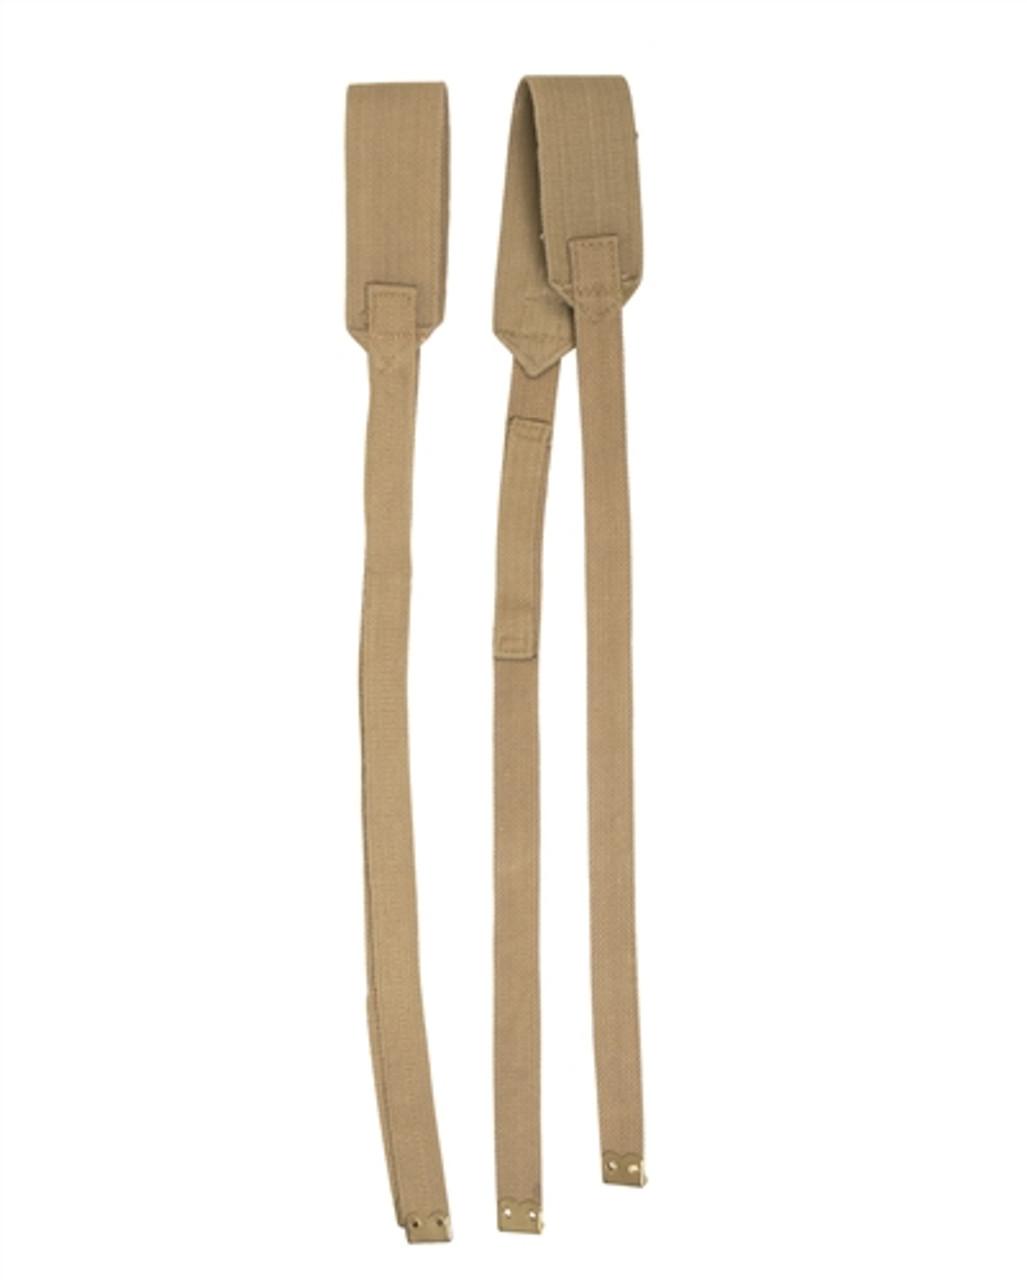 British P37 Field Suspenders from Hessen Antique